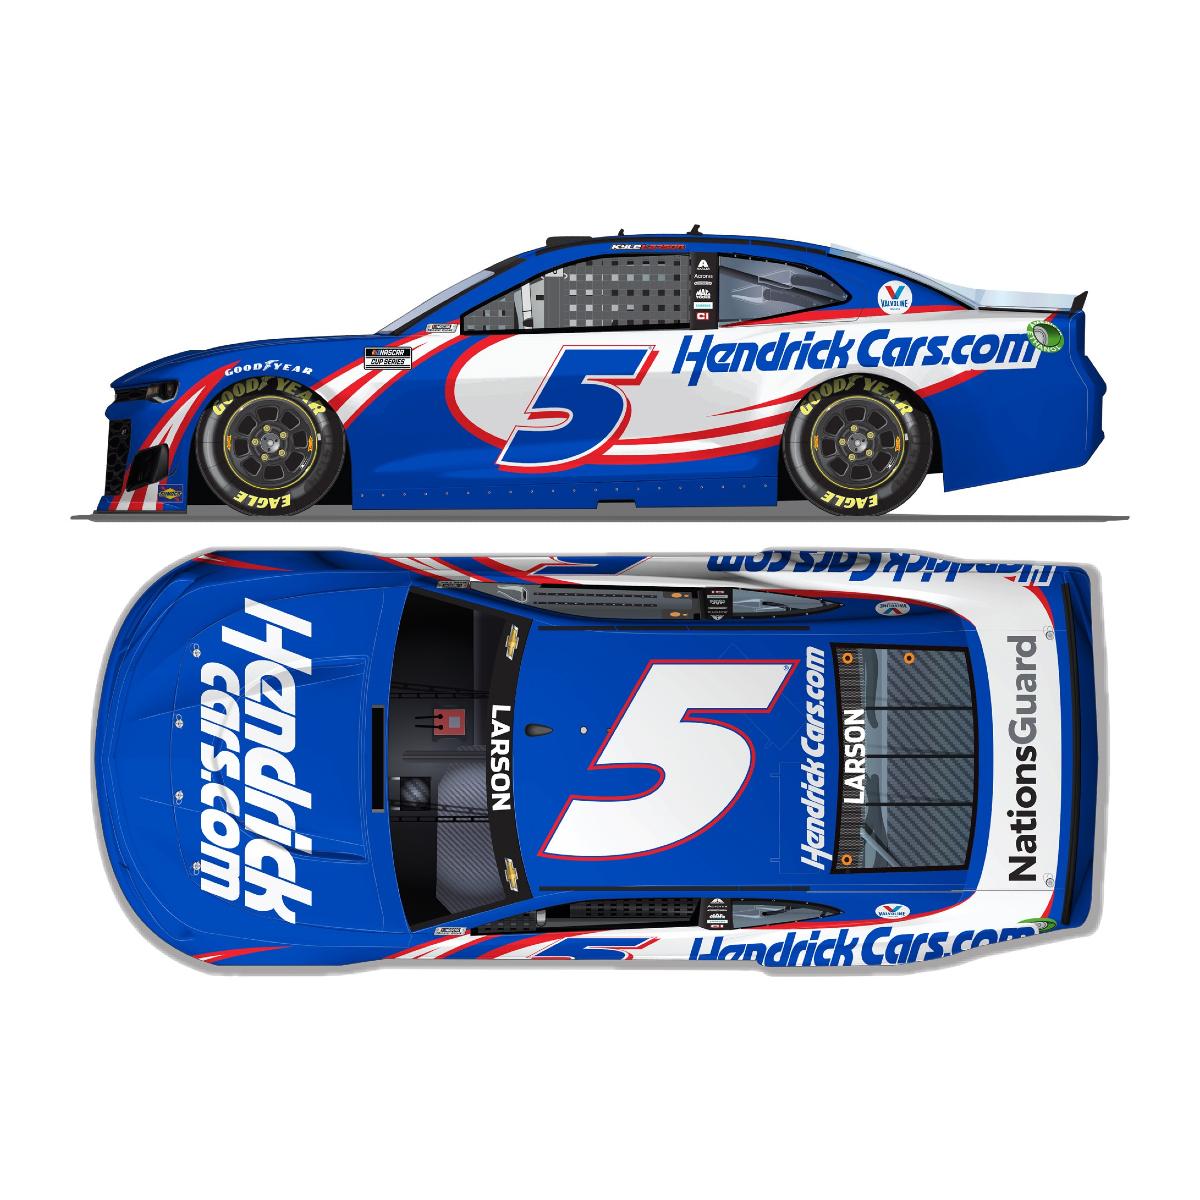 Kyle Larson #5 2021 HendrickCars.com Chevrolet 1:24 ELITE Die-Cast